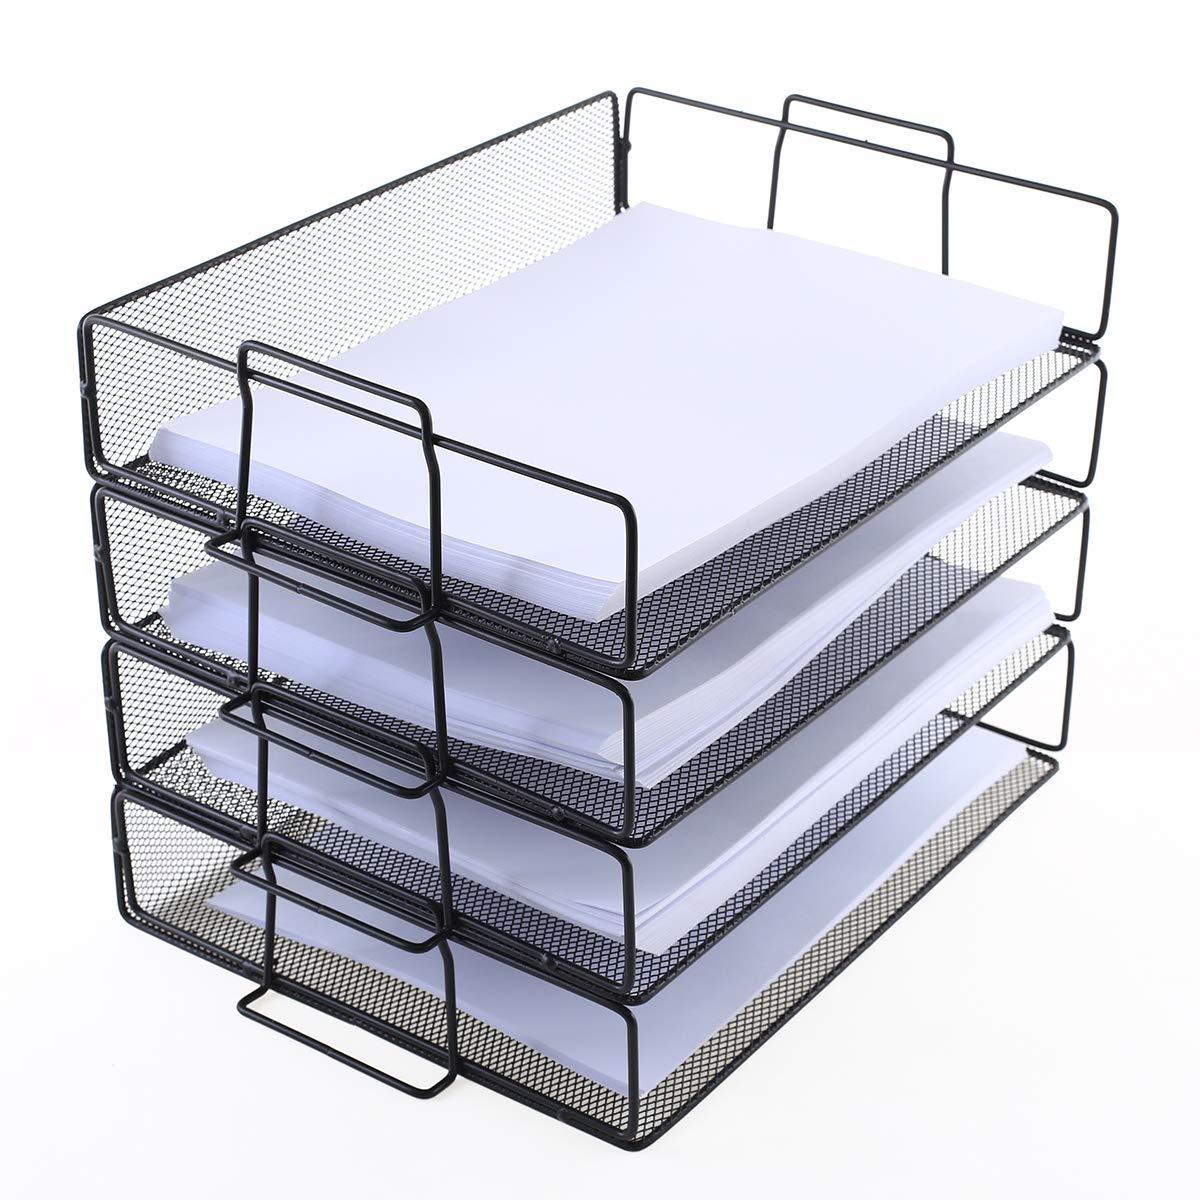 4 Tier Stackable Paper Tray - Metal Mesh Office File Organizer for Desk Printer Letter Teacher Paper Black Color by DeElf